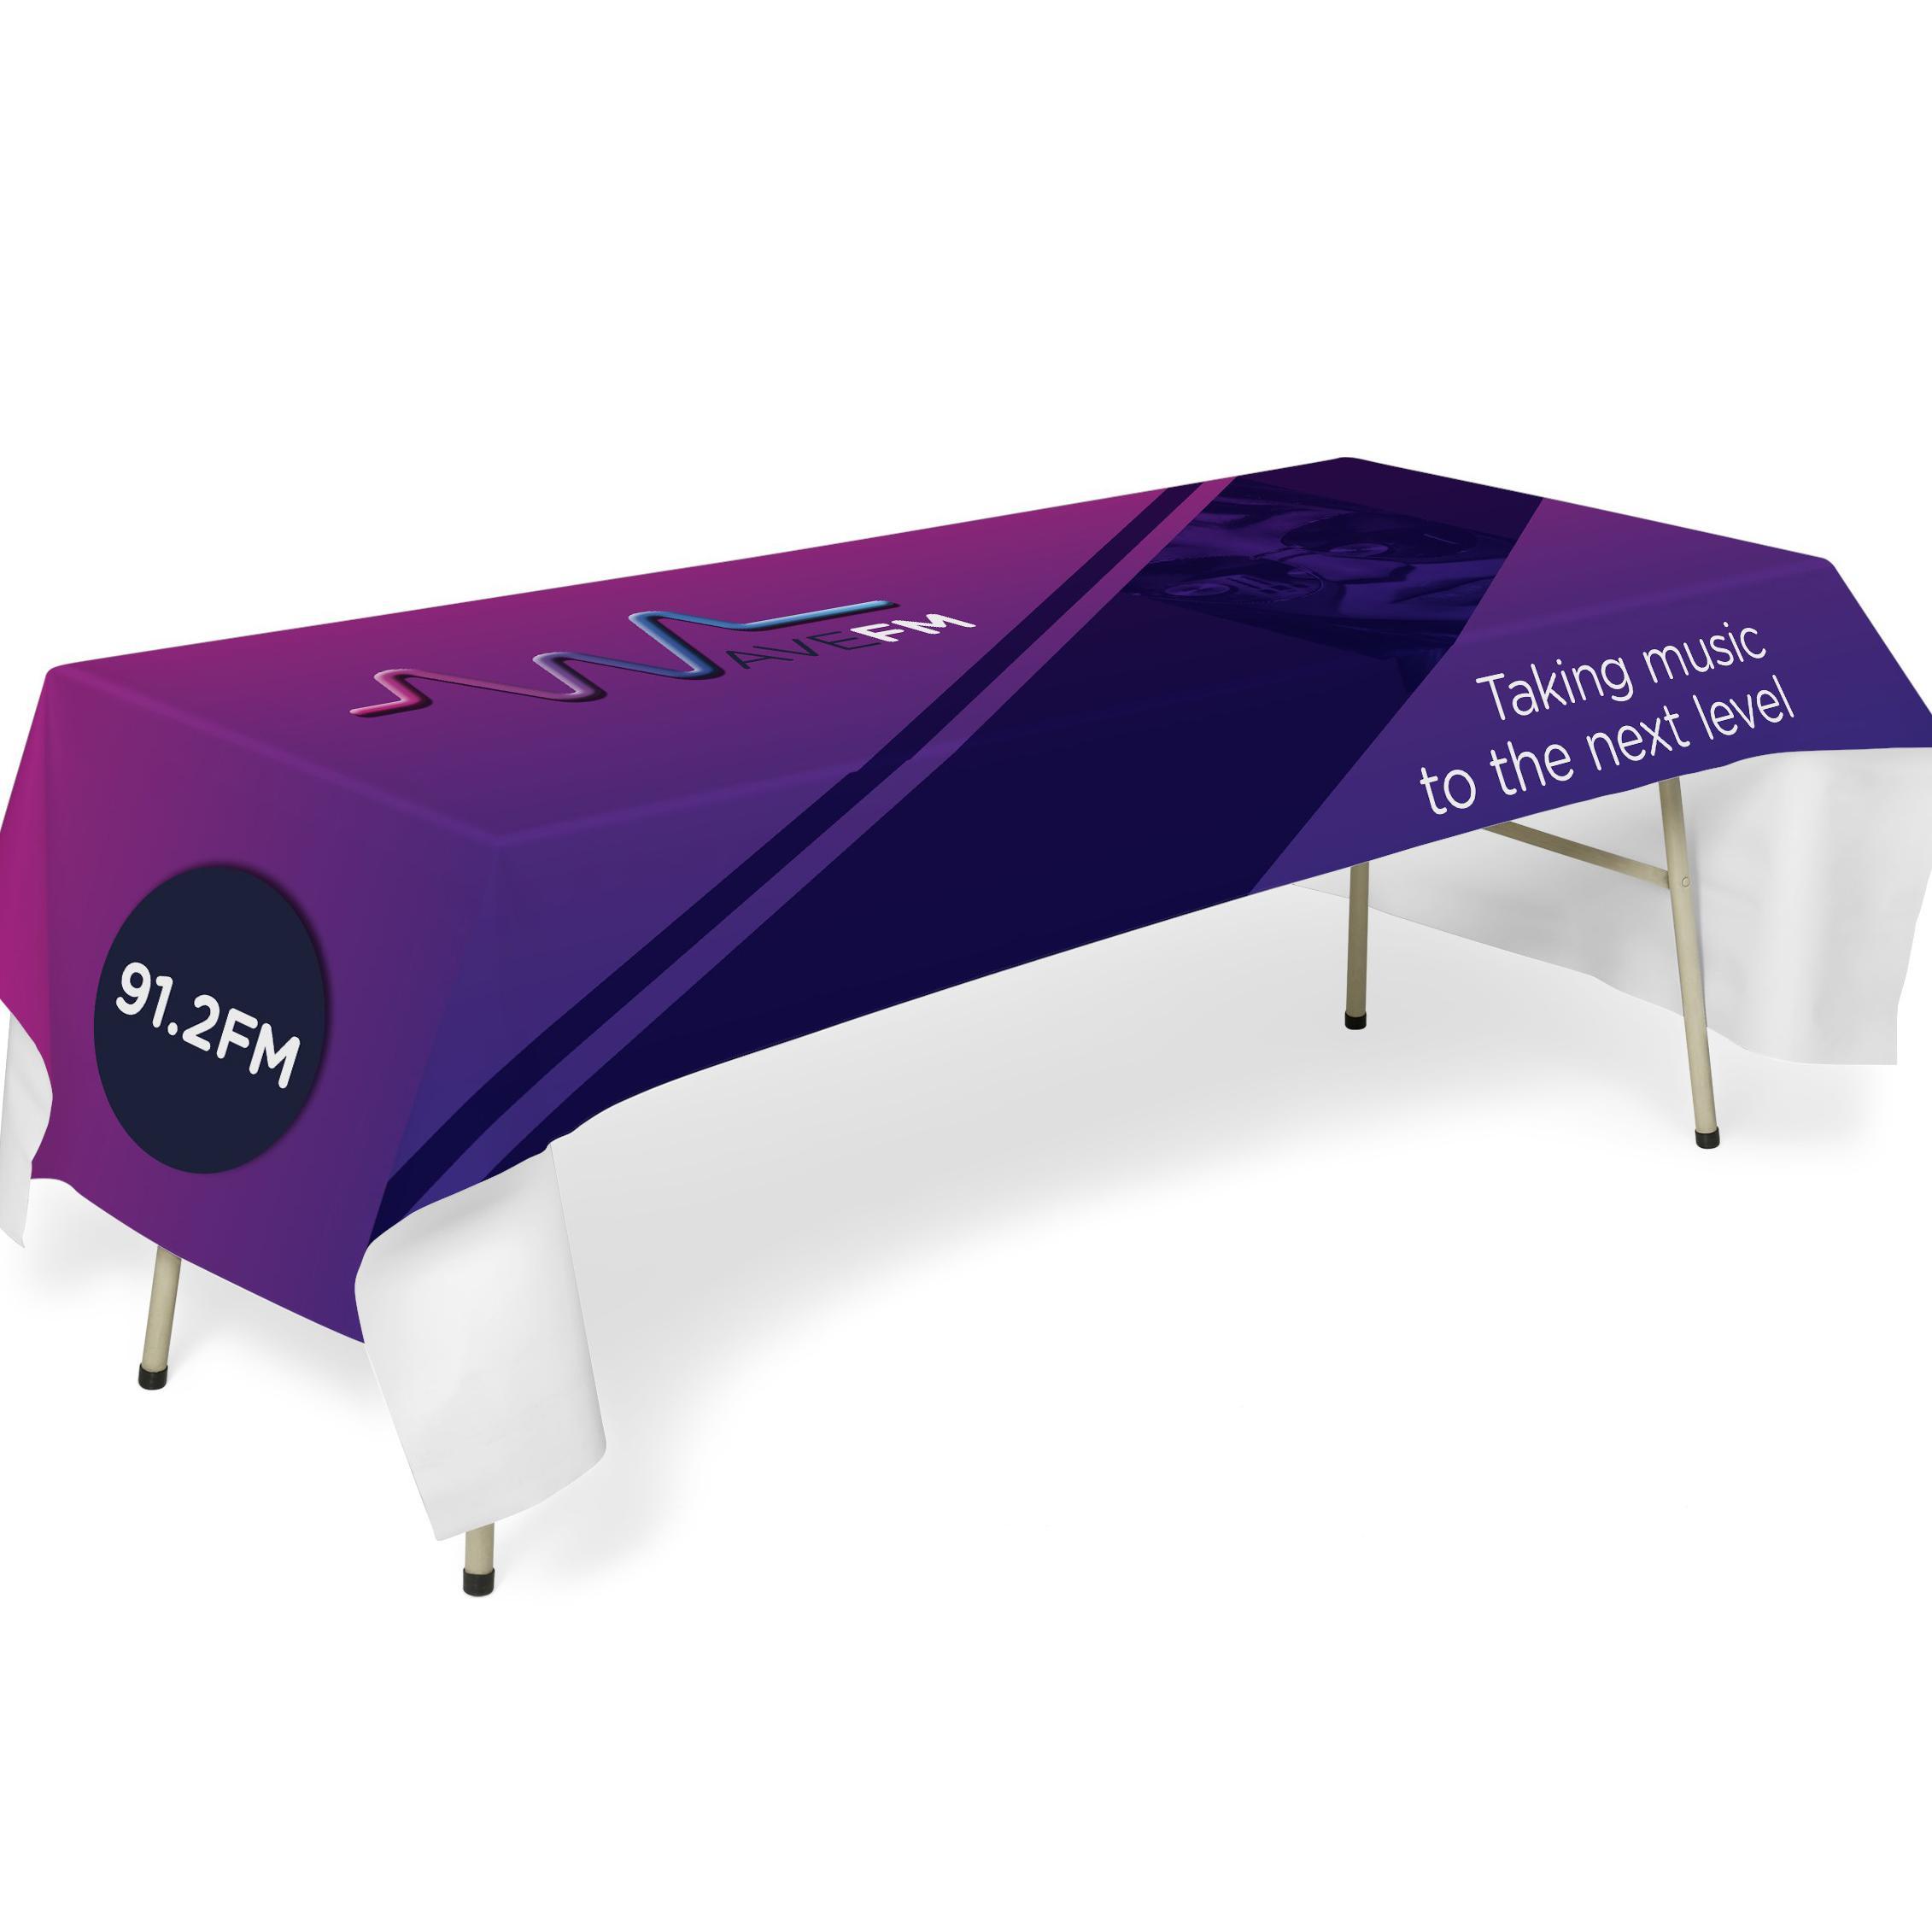 Champion Pvc Tablecloth 3m X 1.25m